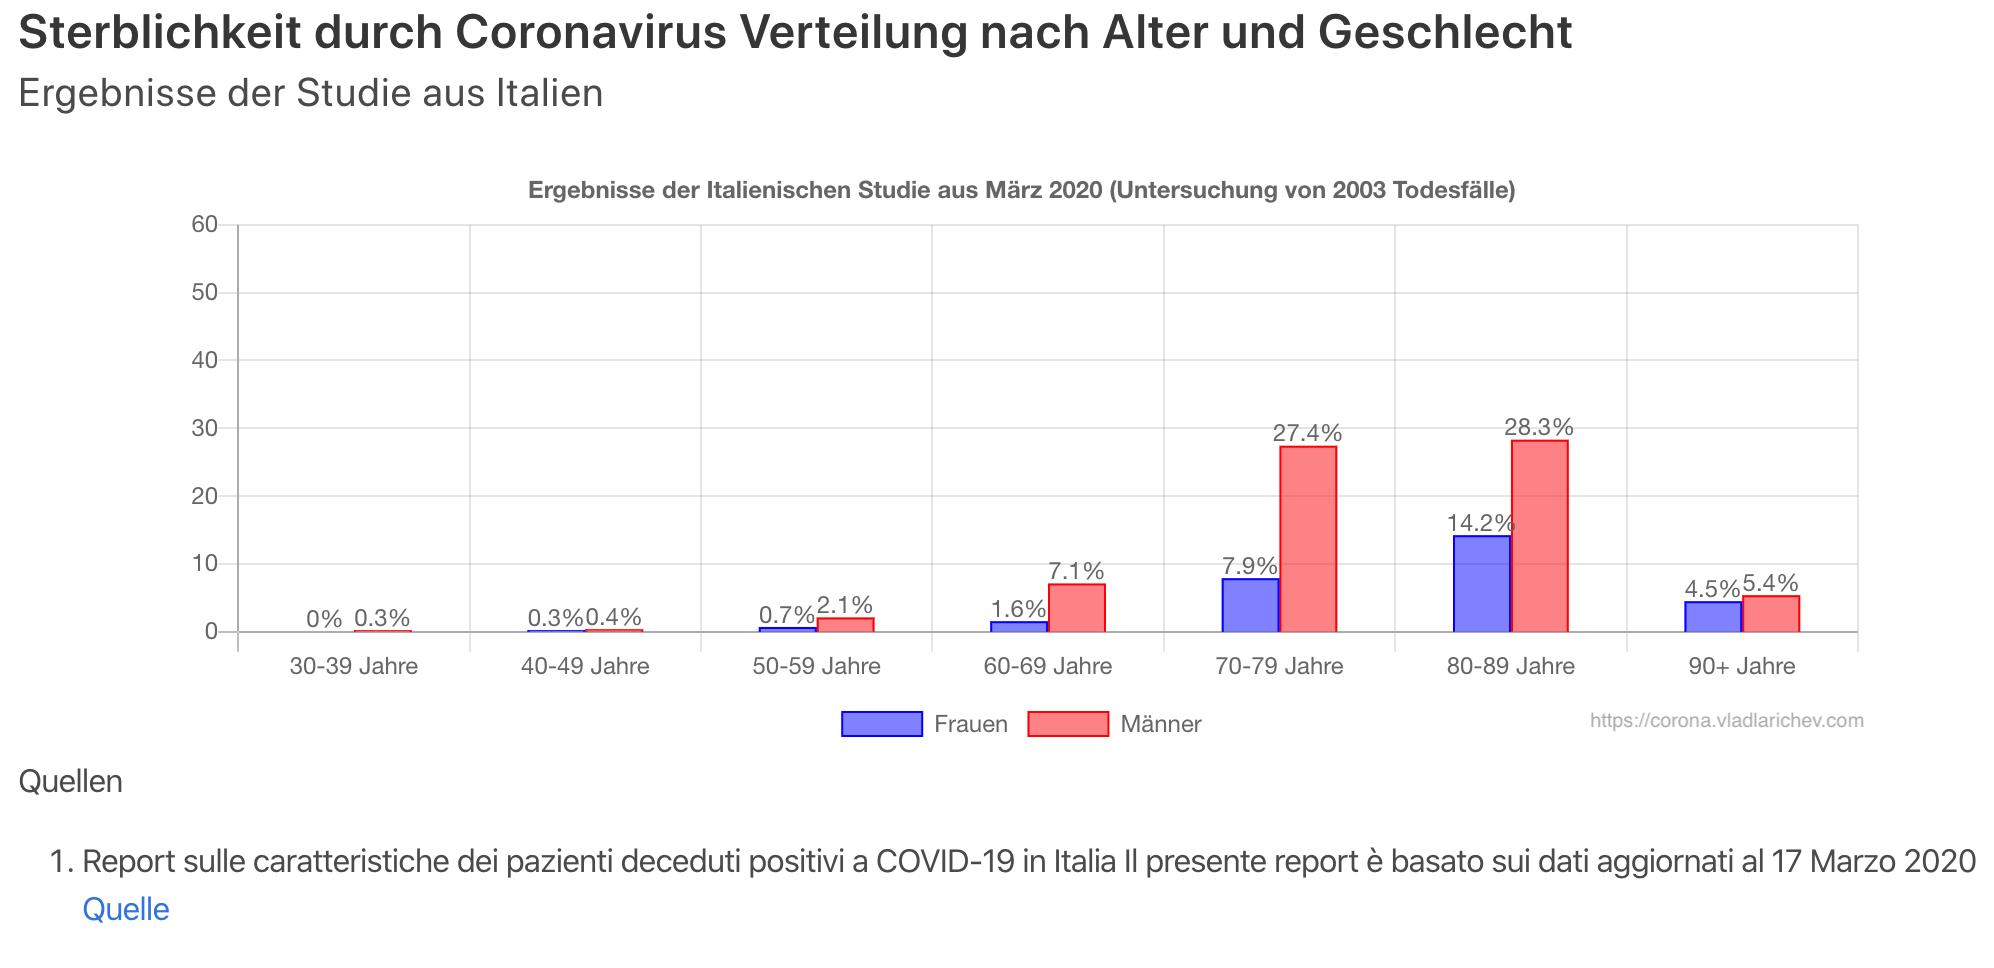 Corona Verteilung nach Geschlecht Studie Grafik Chart